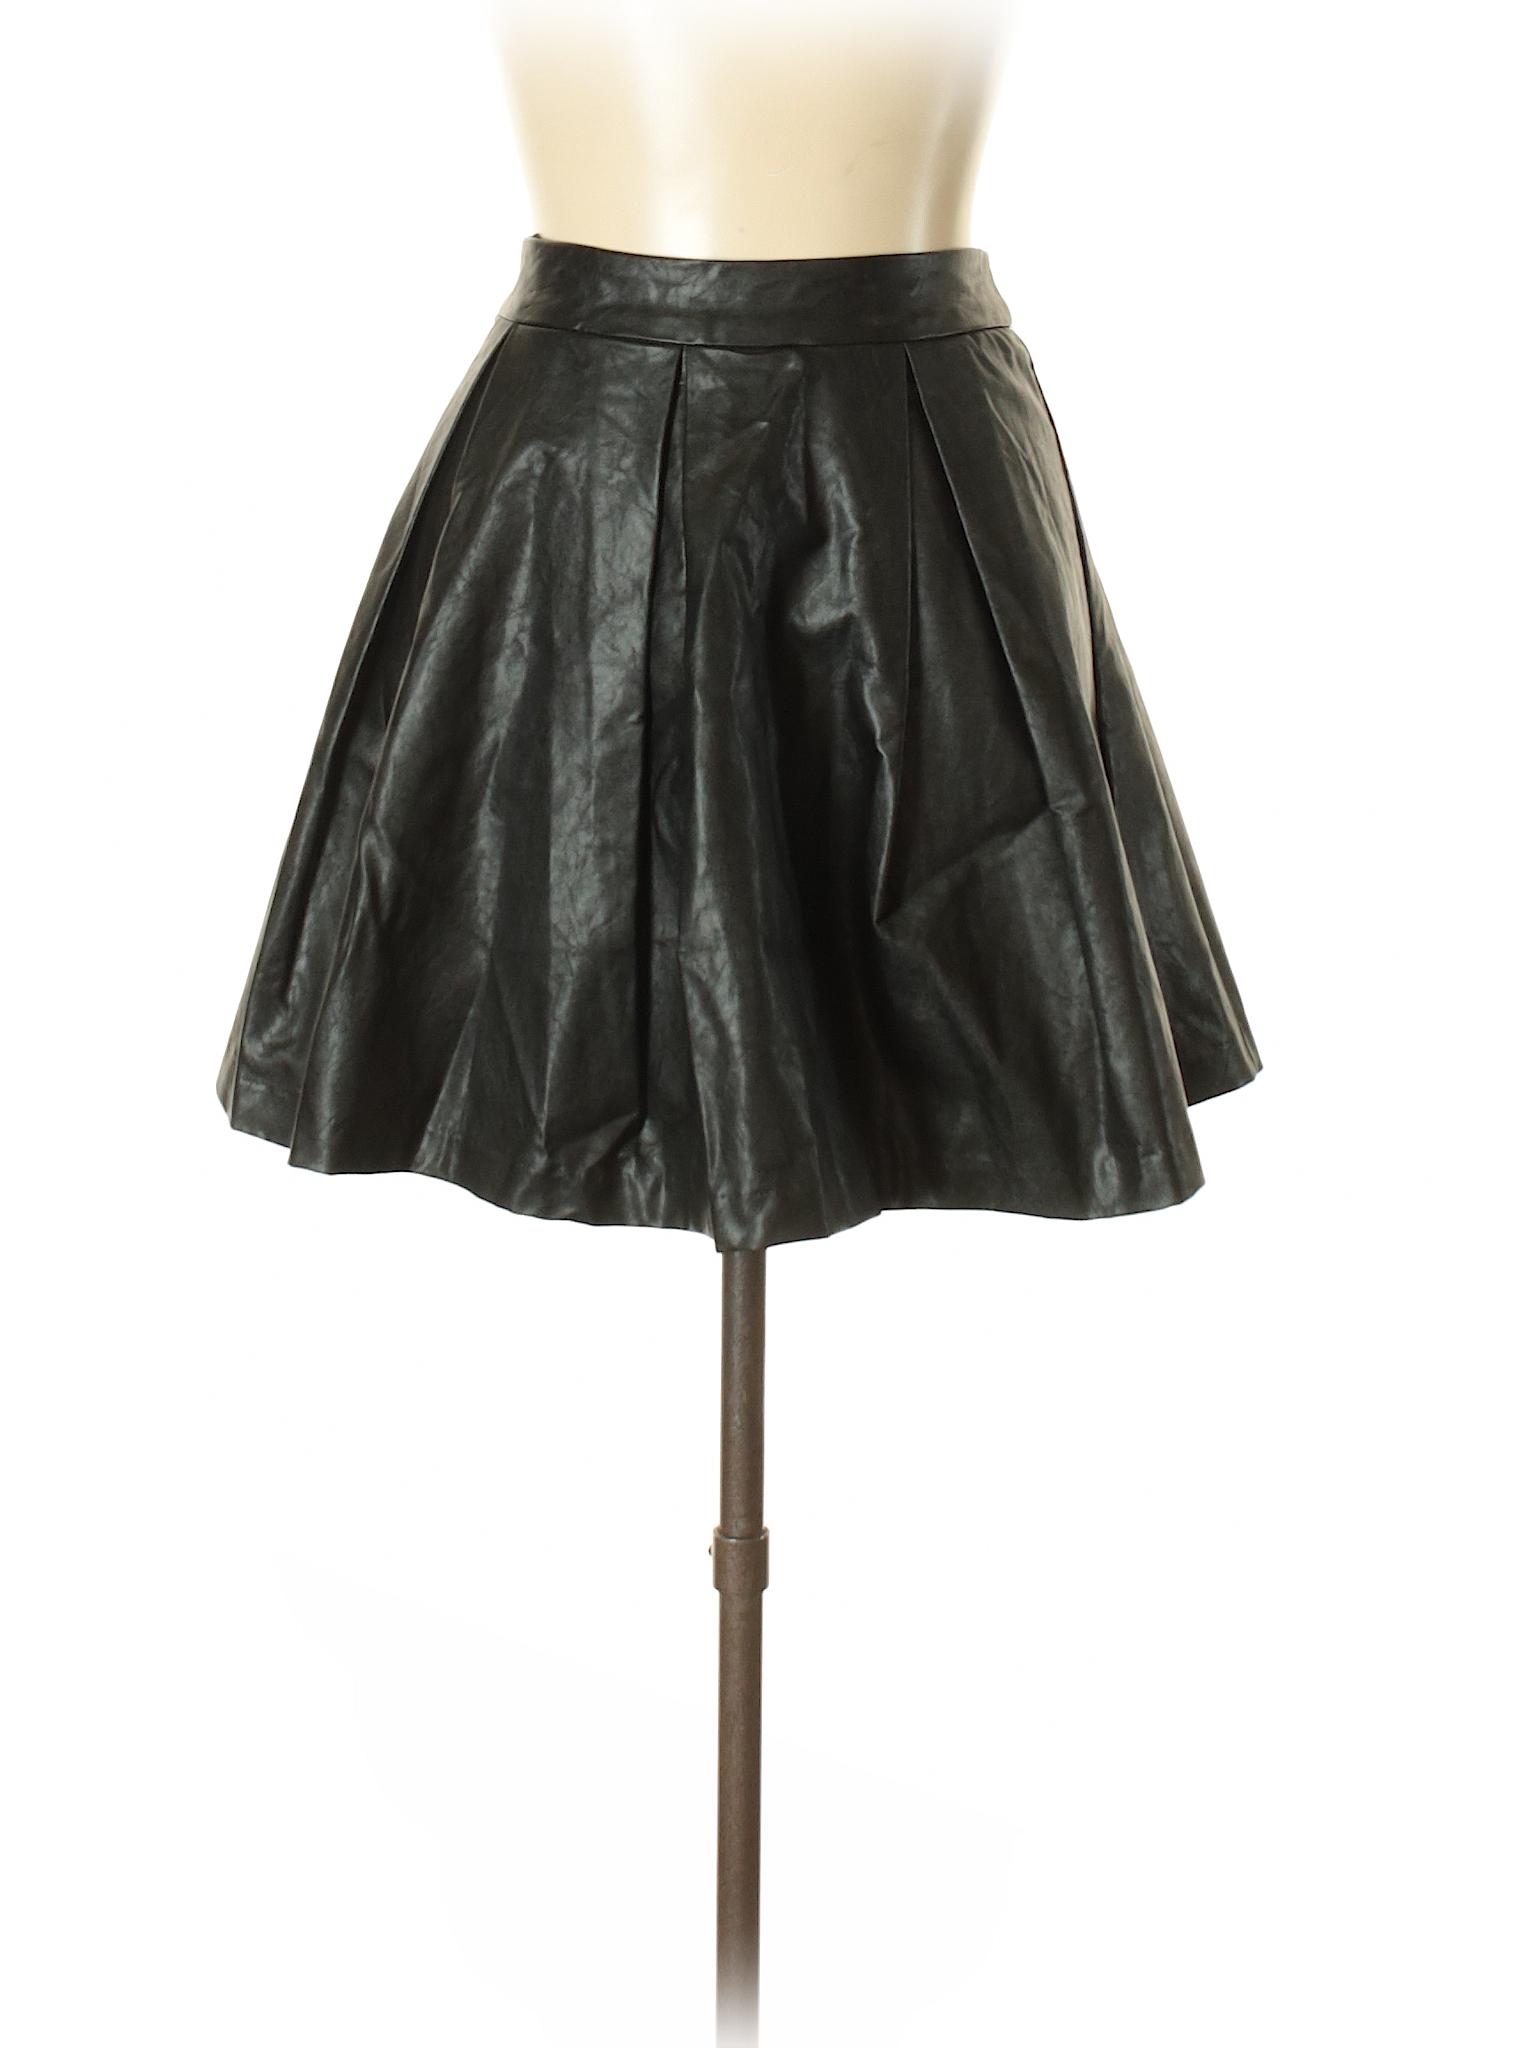 Leather Skirt Boutique Boutique Faux Leather Skirt Faux RqHXqx